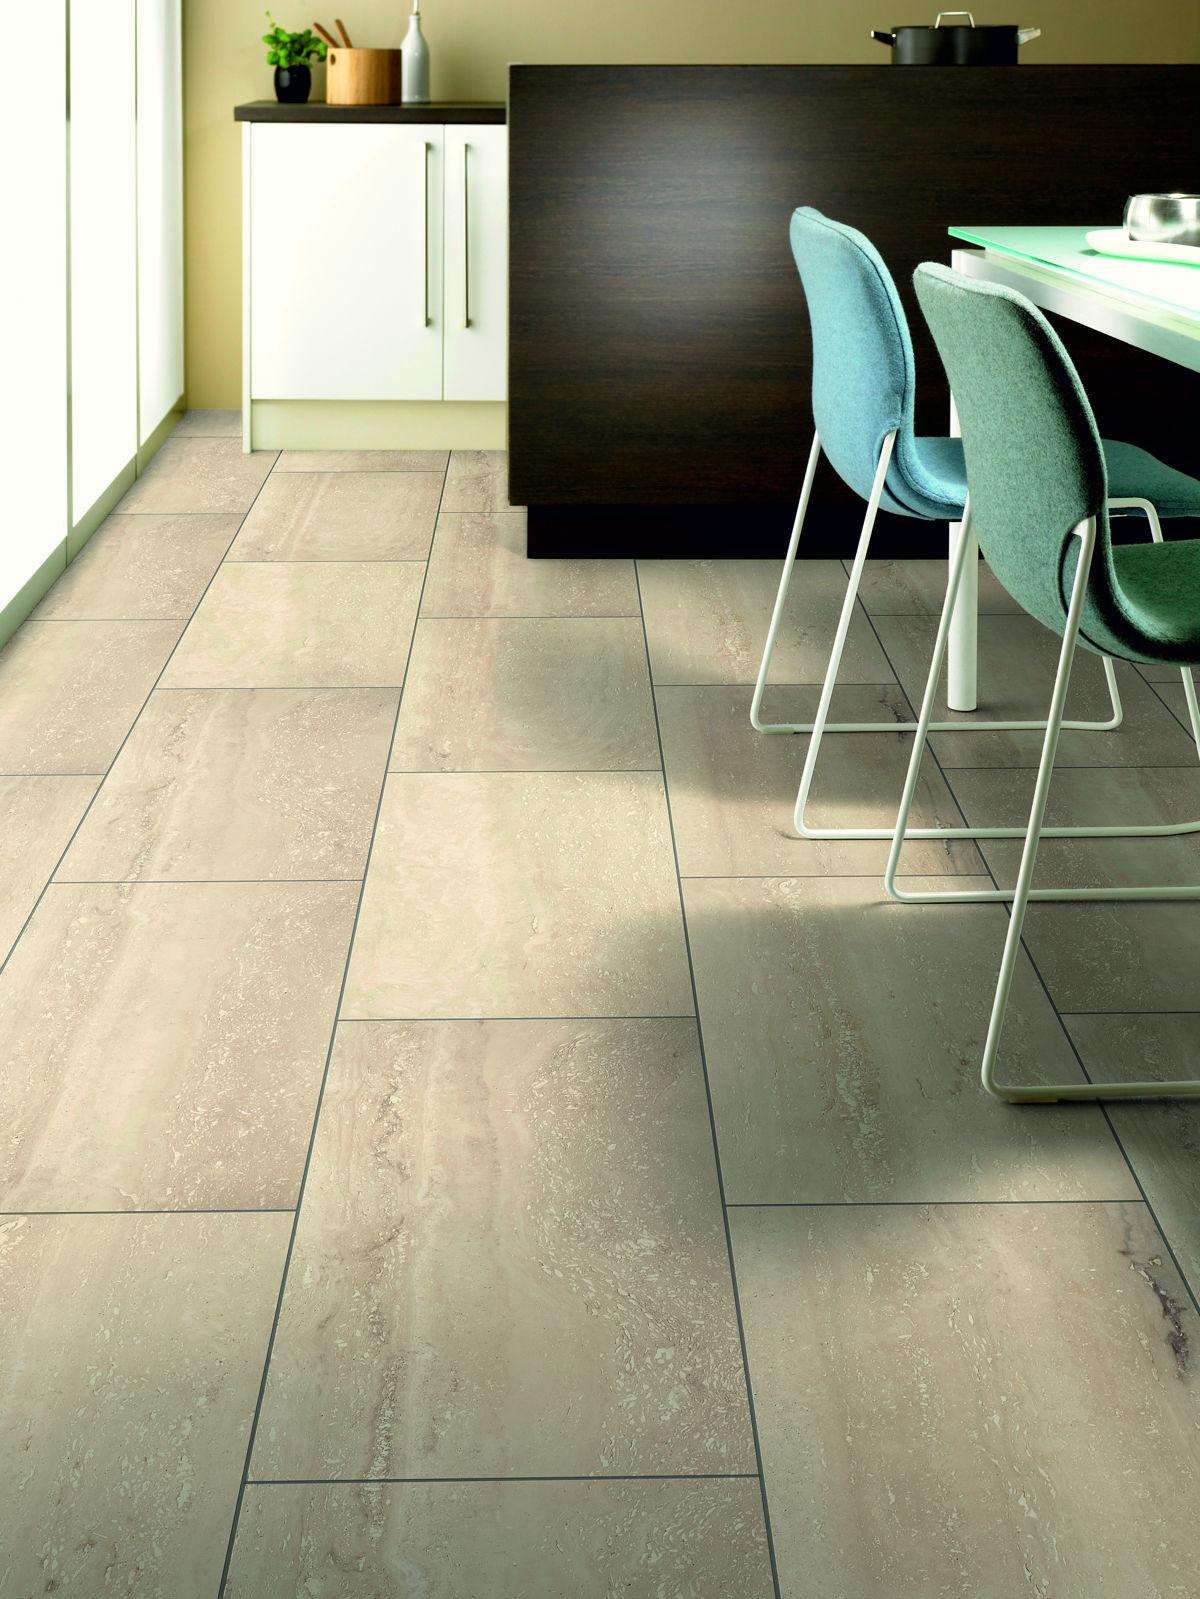 laminate floor tiles kronospan stone impression palatino travertine laminate tile and laminate  flooring combinations LPKVXBK